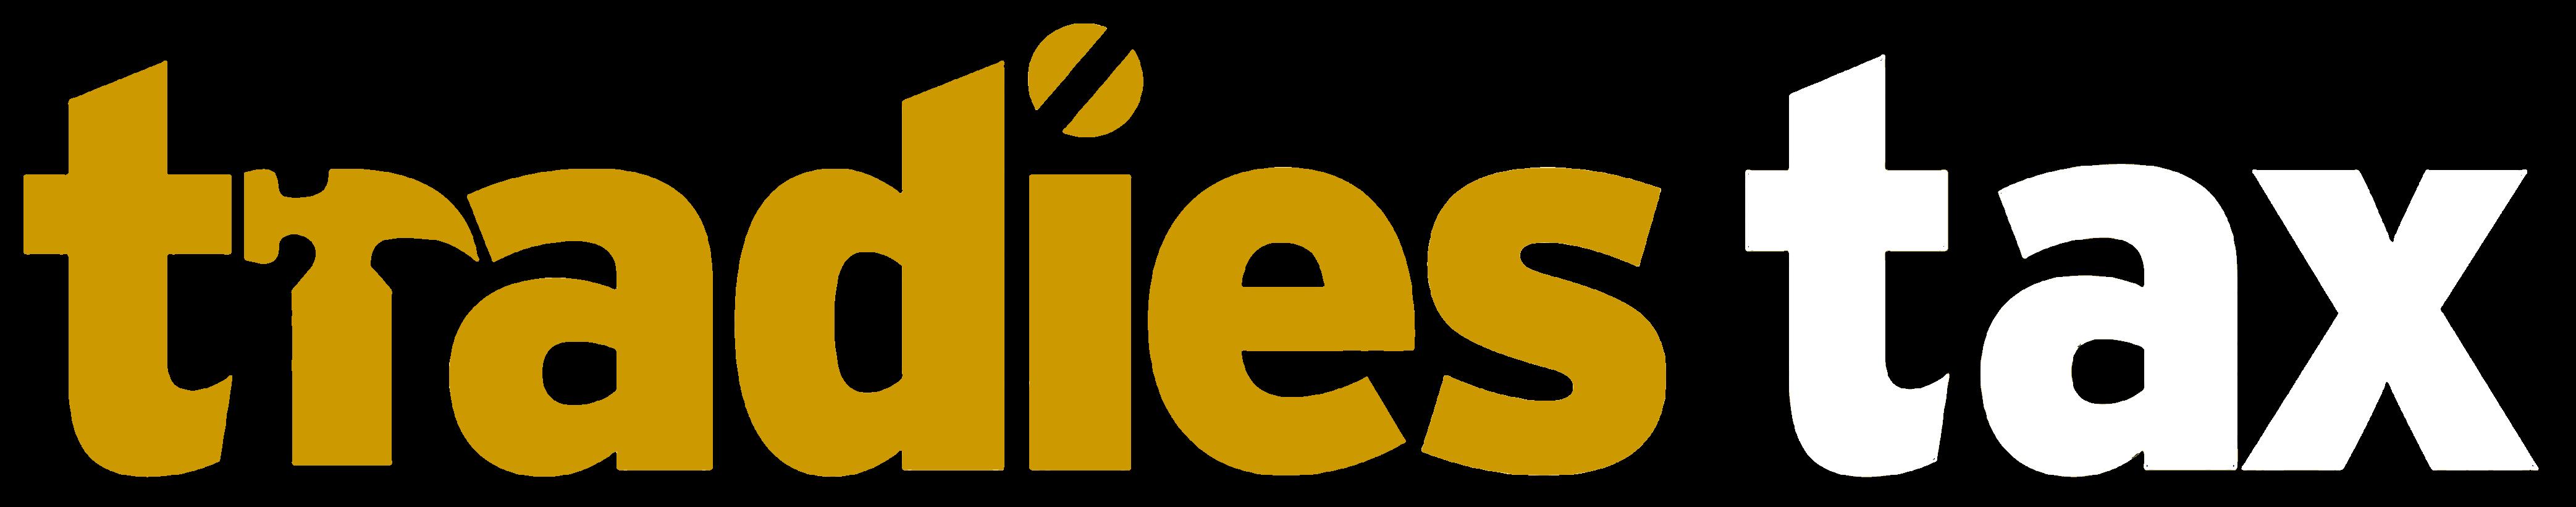 TradiesTax Logo